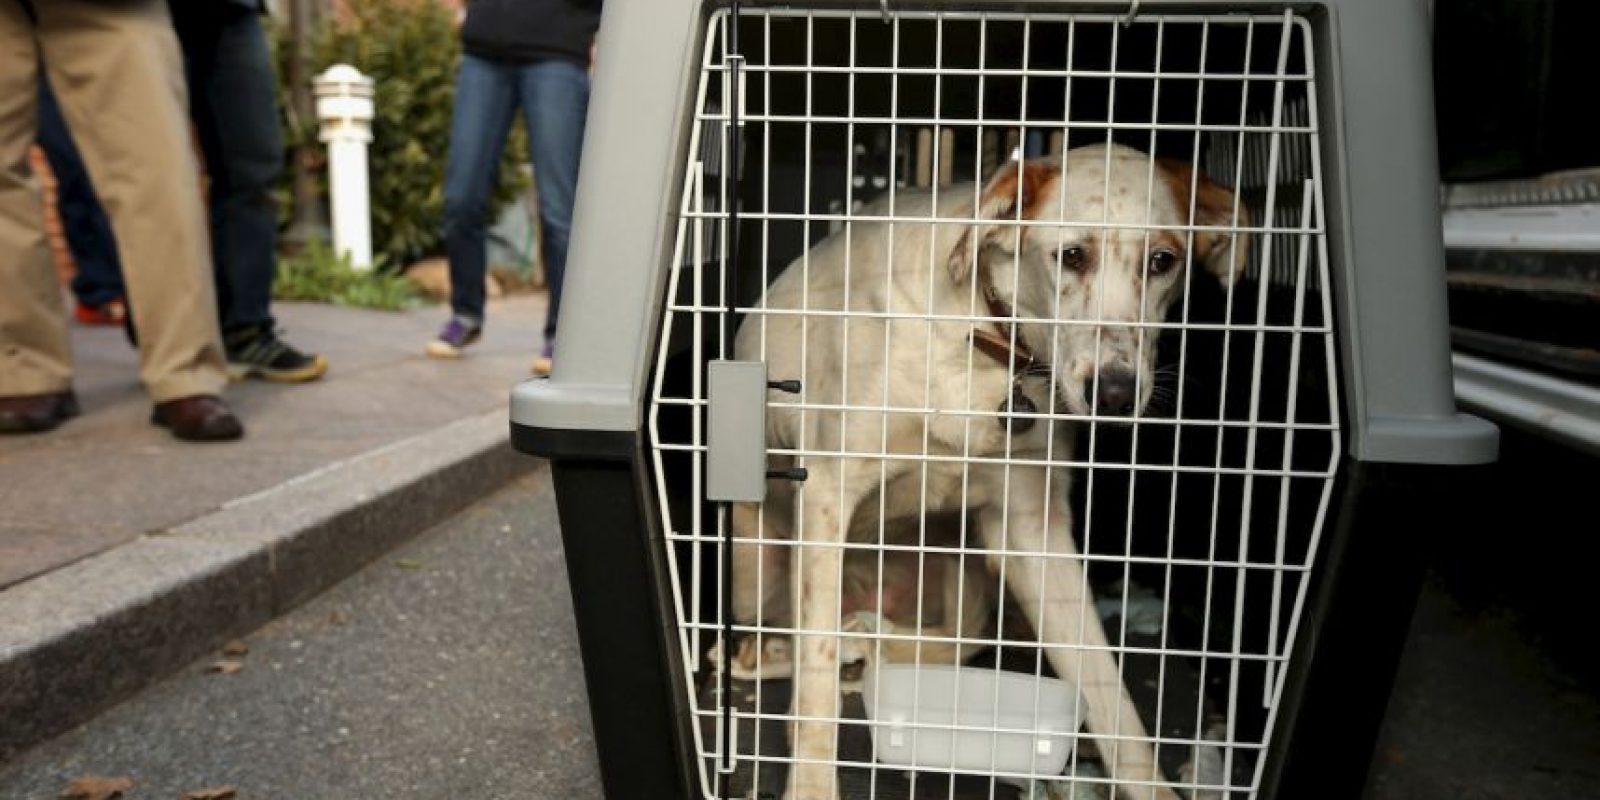 Aspectos a considerar antes de adoptar una mascota Foto:Getty Images